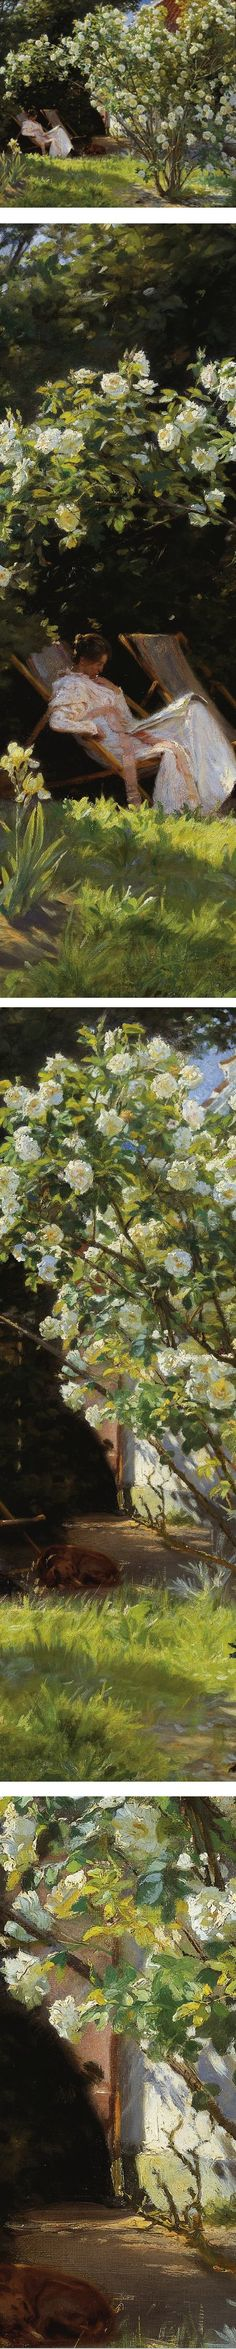 Roses. Marie Kroyer seated in the deckchair in the garden by  Mrs. Bendsen's house, Peder Severin Kroyer